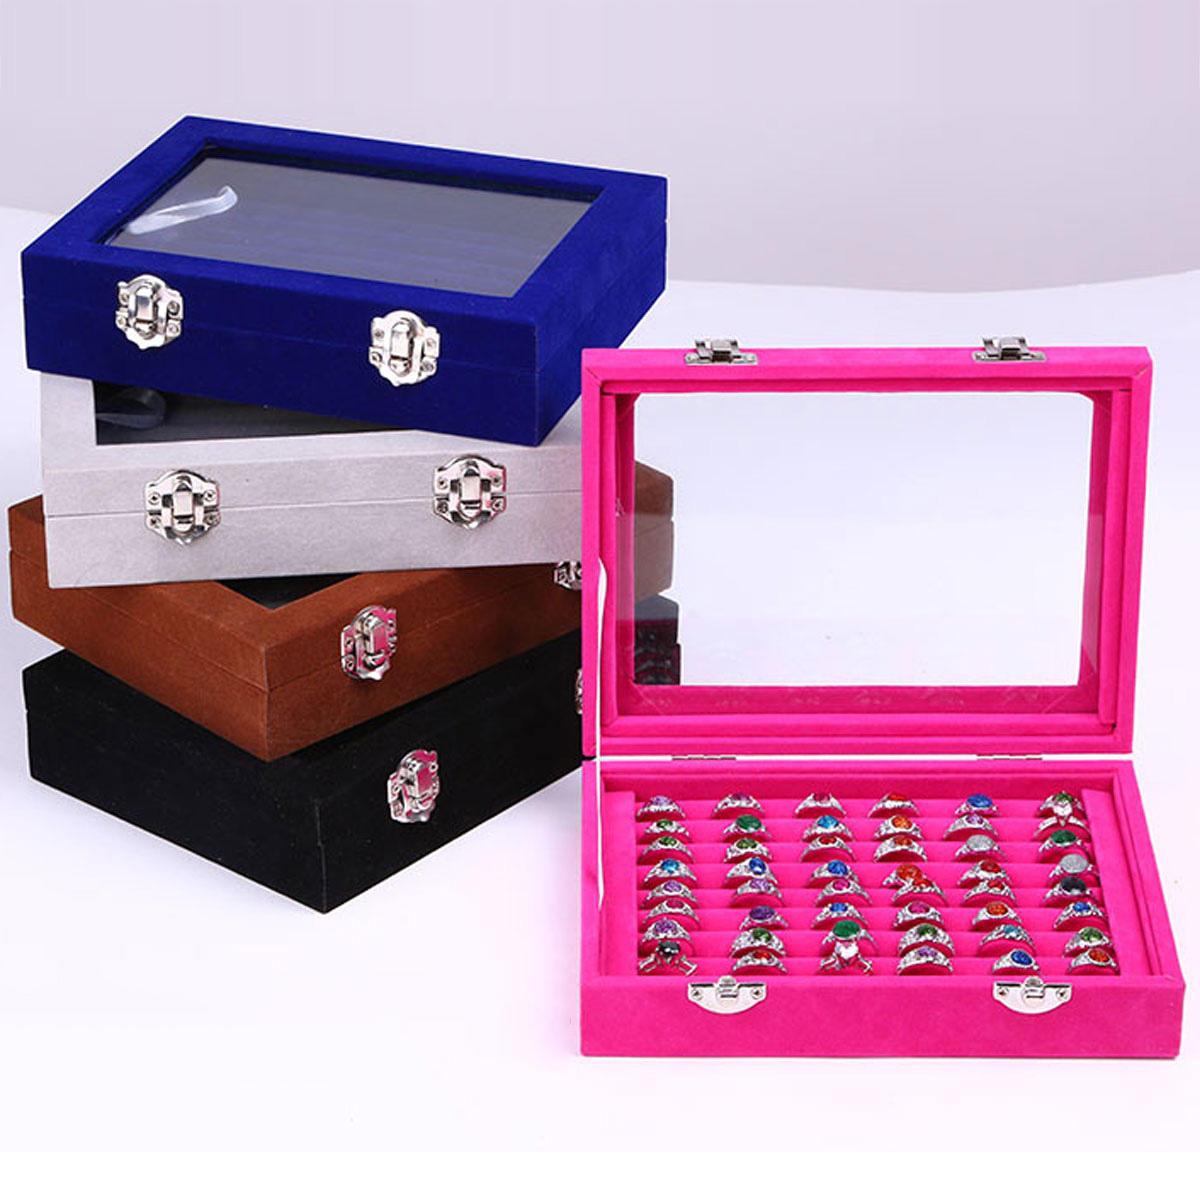 Jewelry Velvet Wood Ring Display Organizer Box Tray Holder Earrings Storage Case